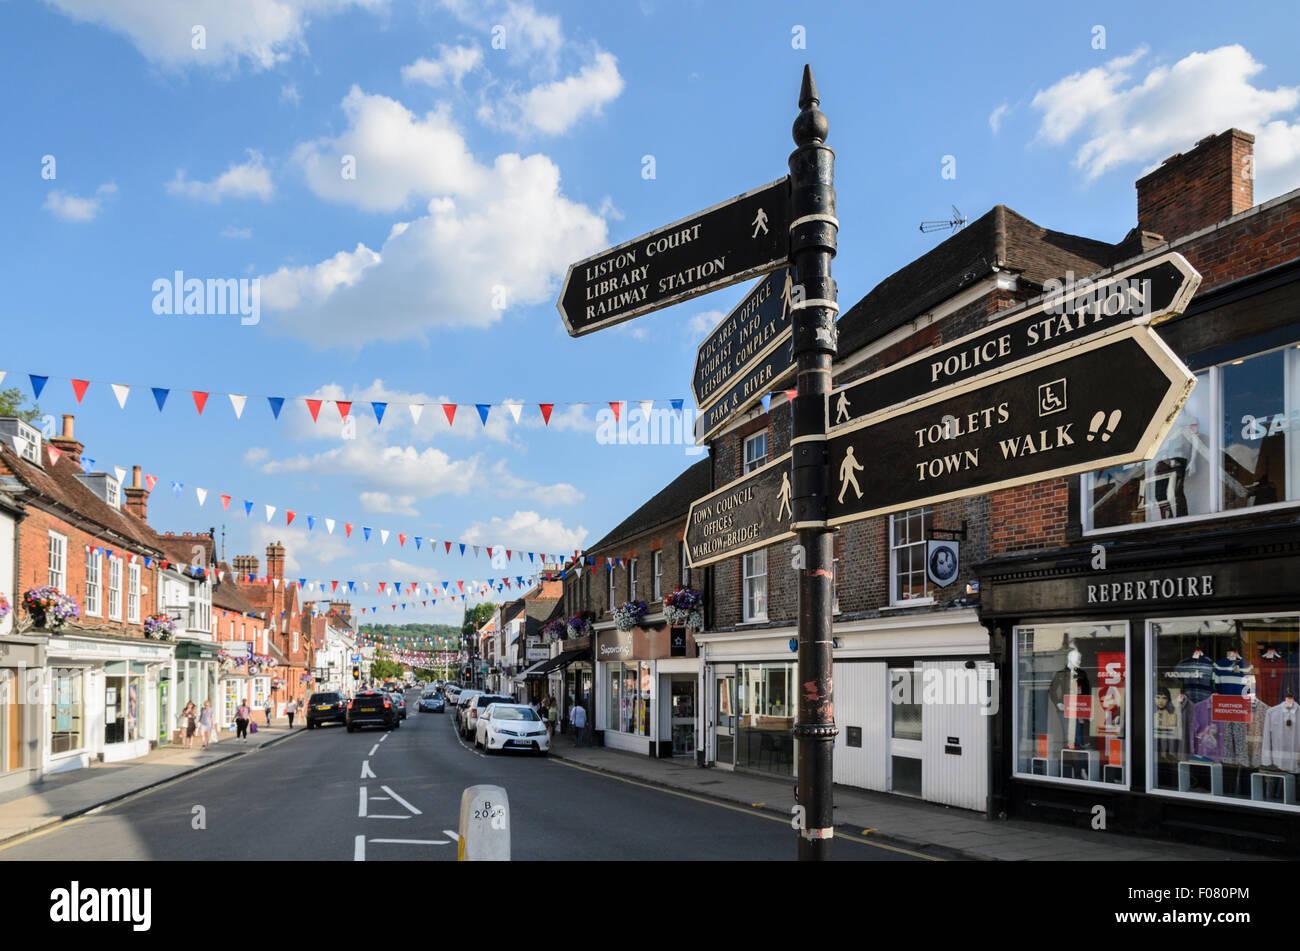 The High Street, Marlow, Buckinghamshire, England, UK. Stock Photo